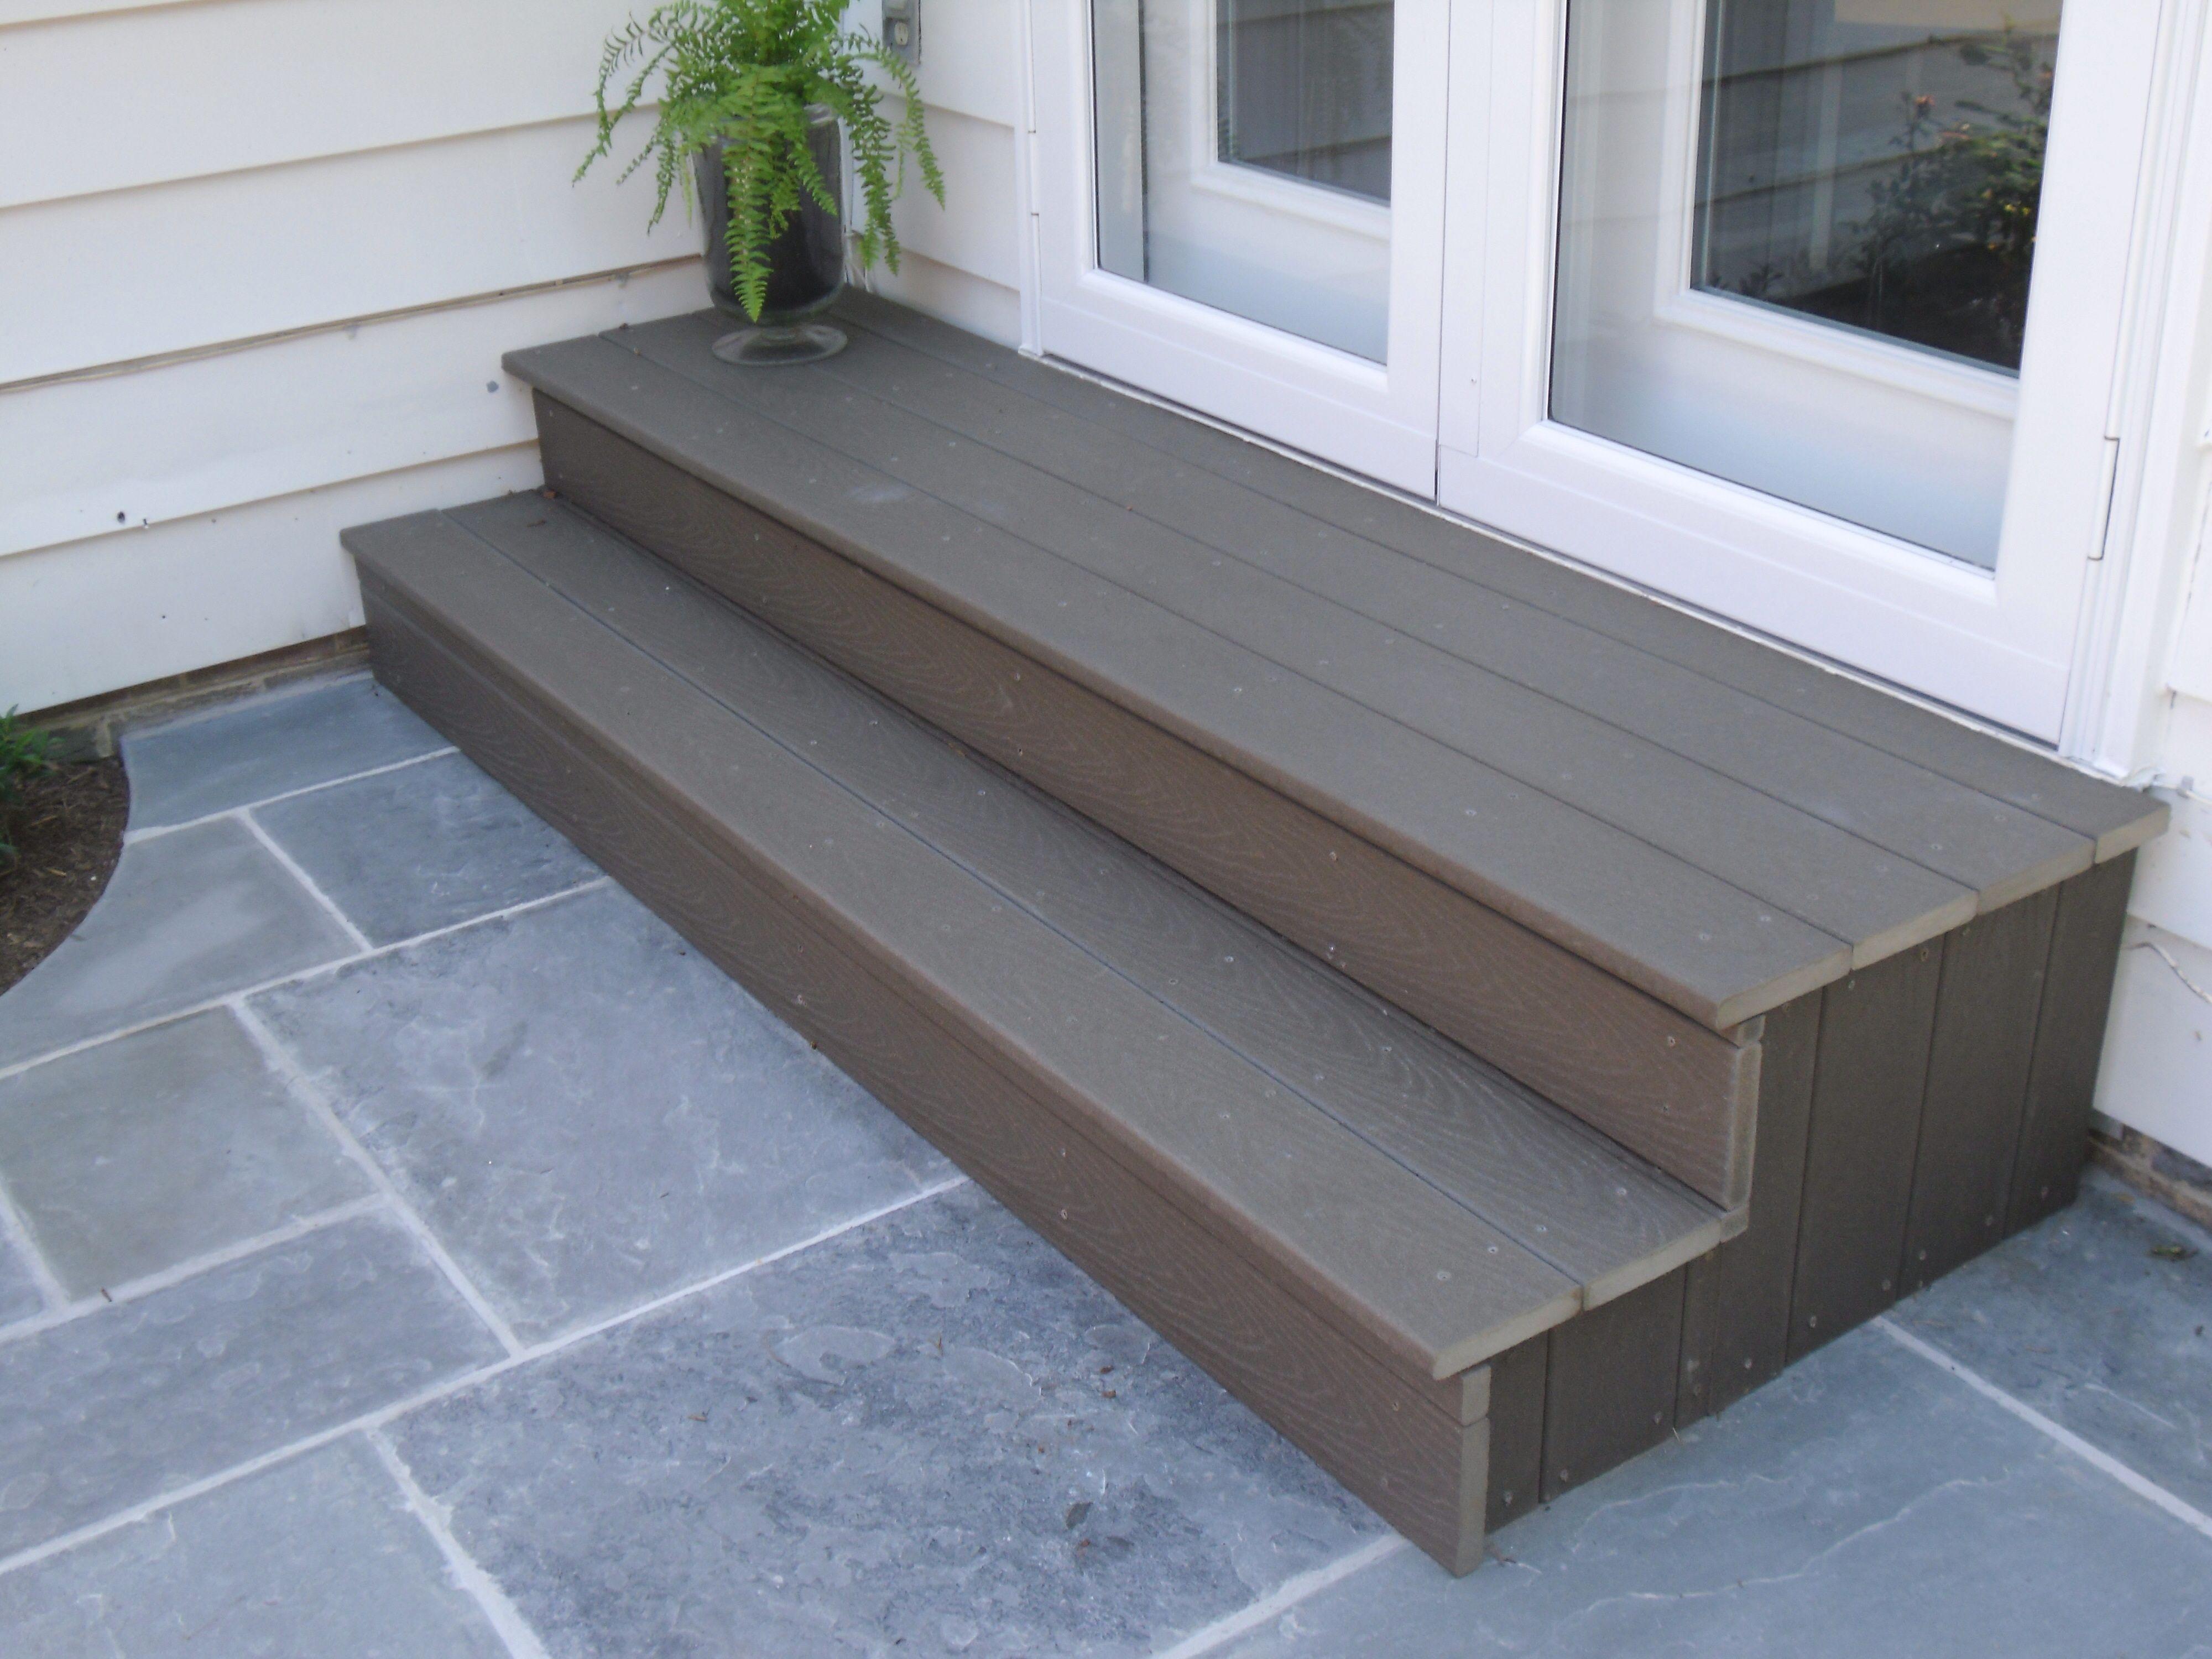 Pin By Green Spaces Landscaping Llc On Decks Patio Steps Diy | Pre Built Wooden Steps | Oak | Exterior | Pre Built | Box | Prefabricated